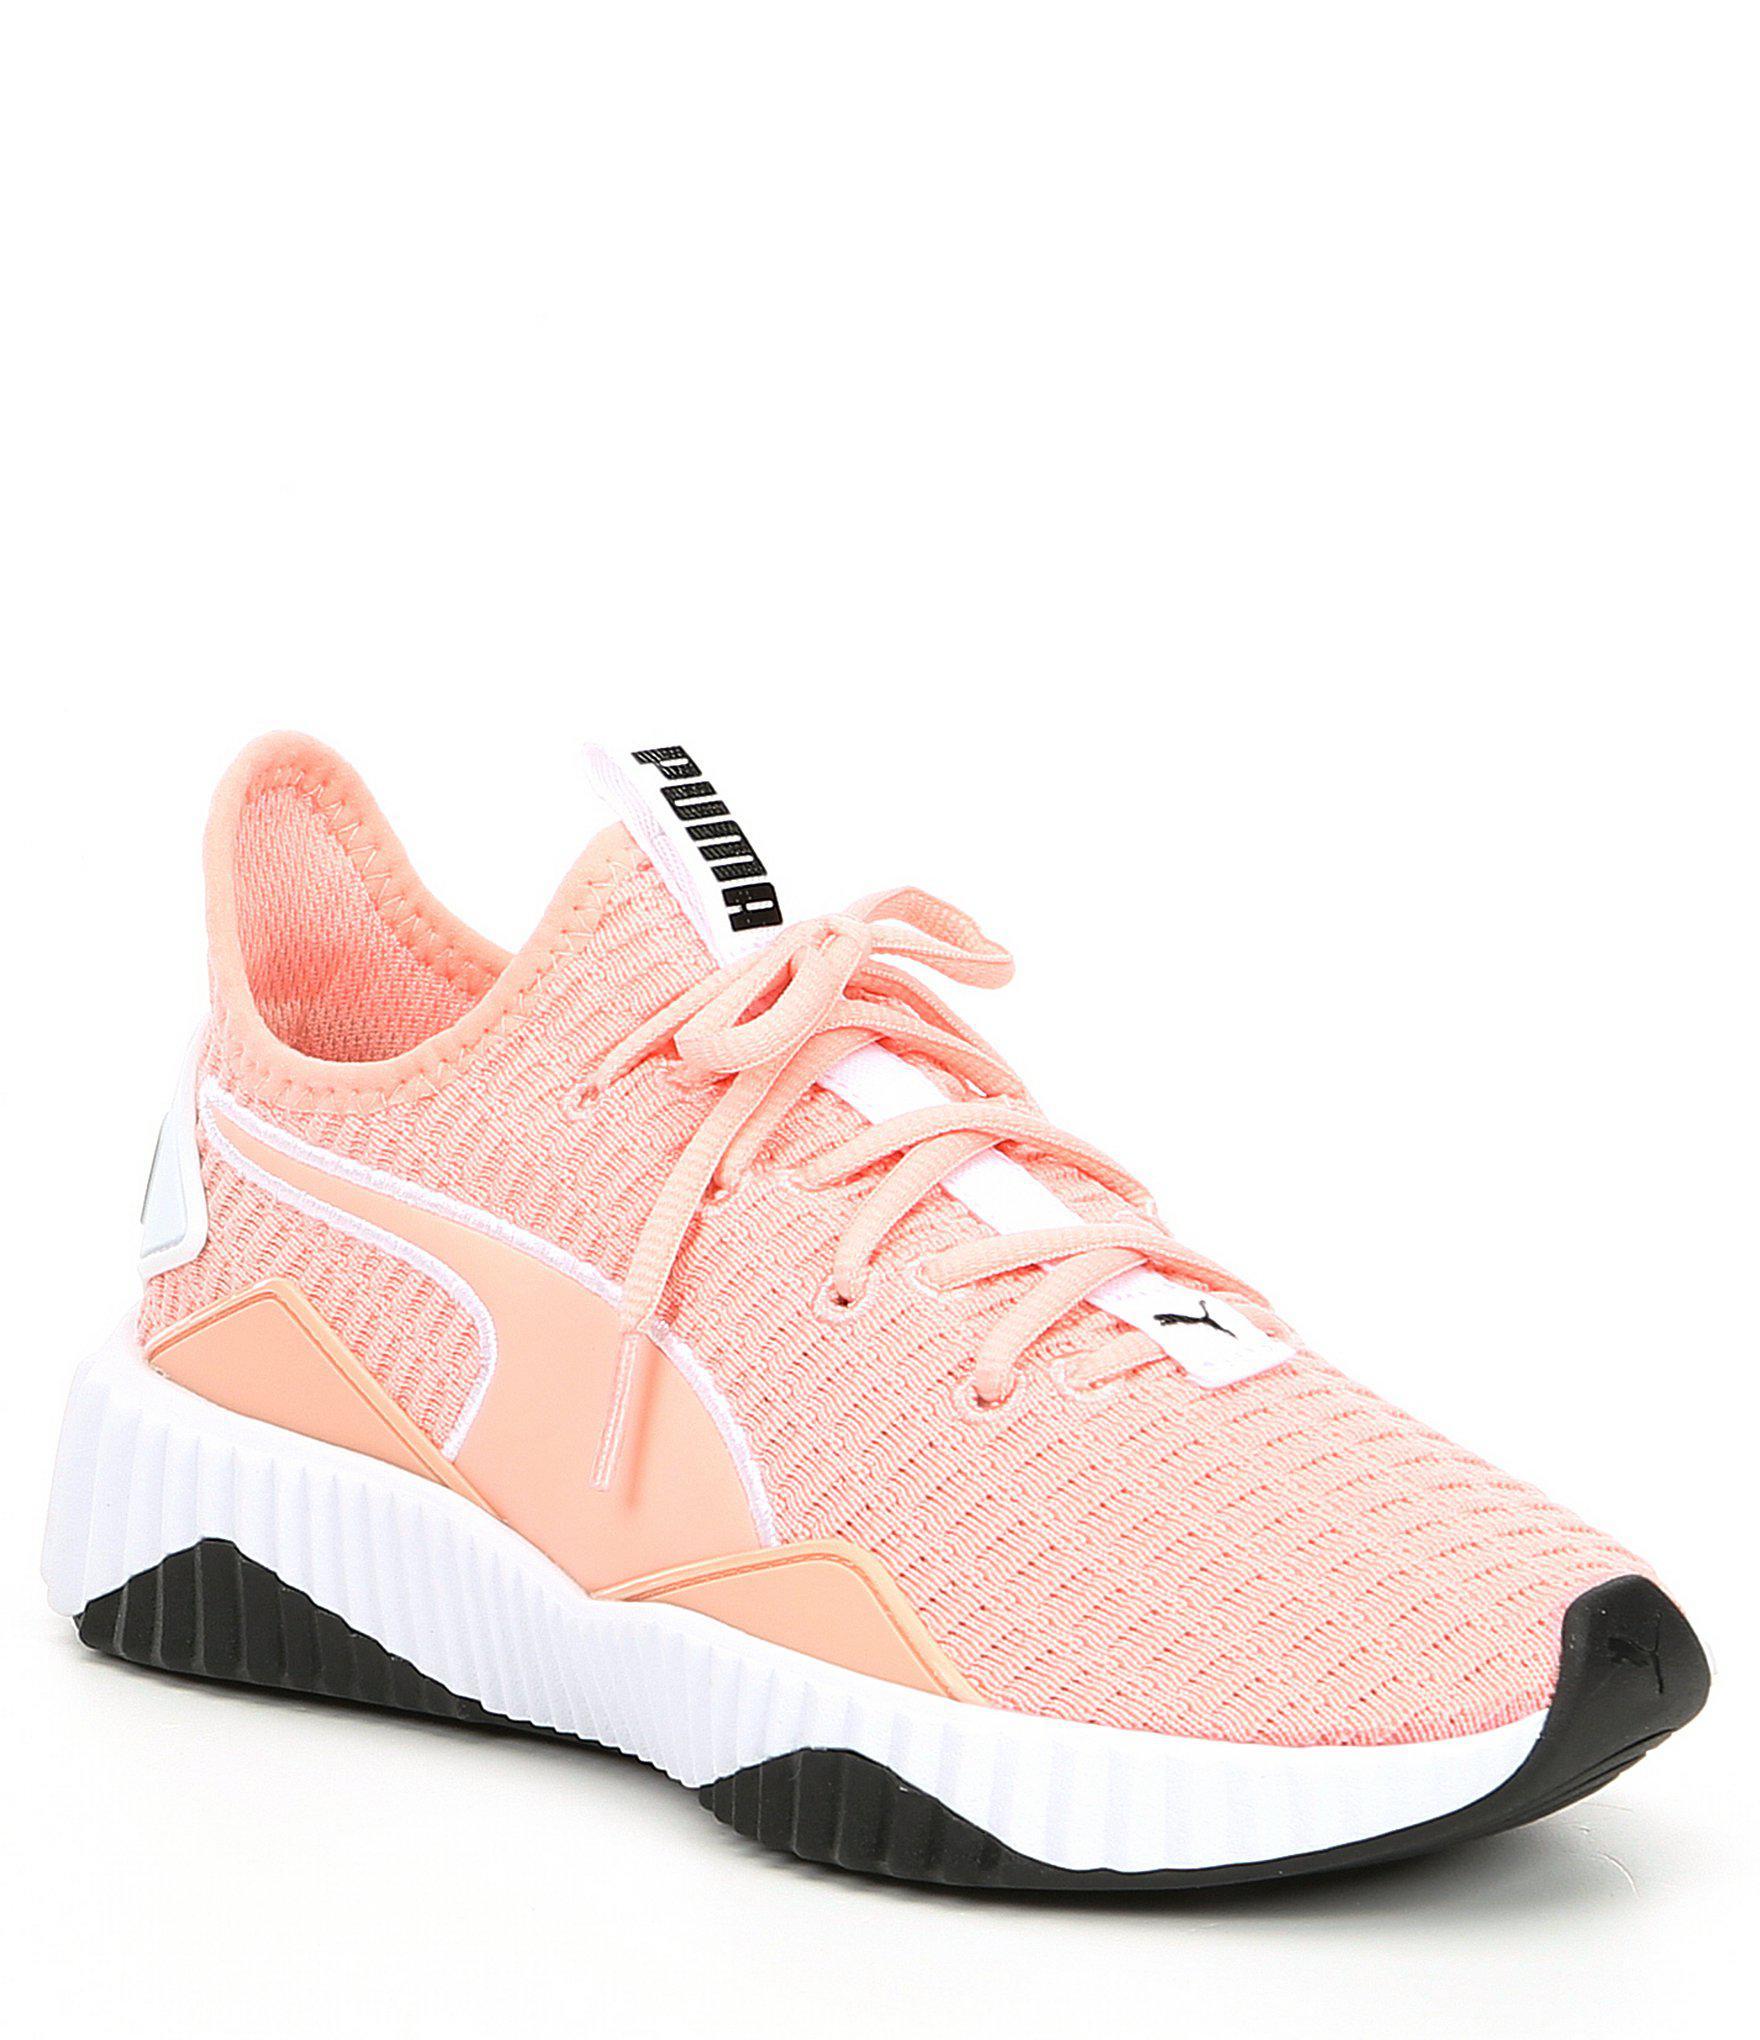 eb208401d5e913 Lyst - PUMA Women s Defy Sneakers in Pink